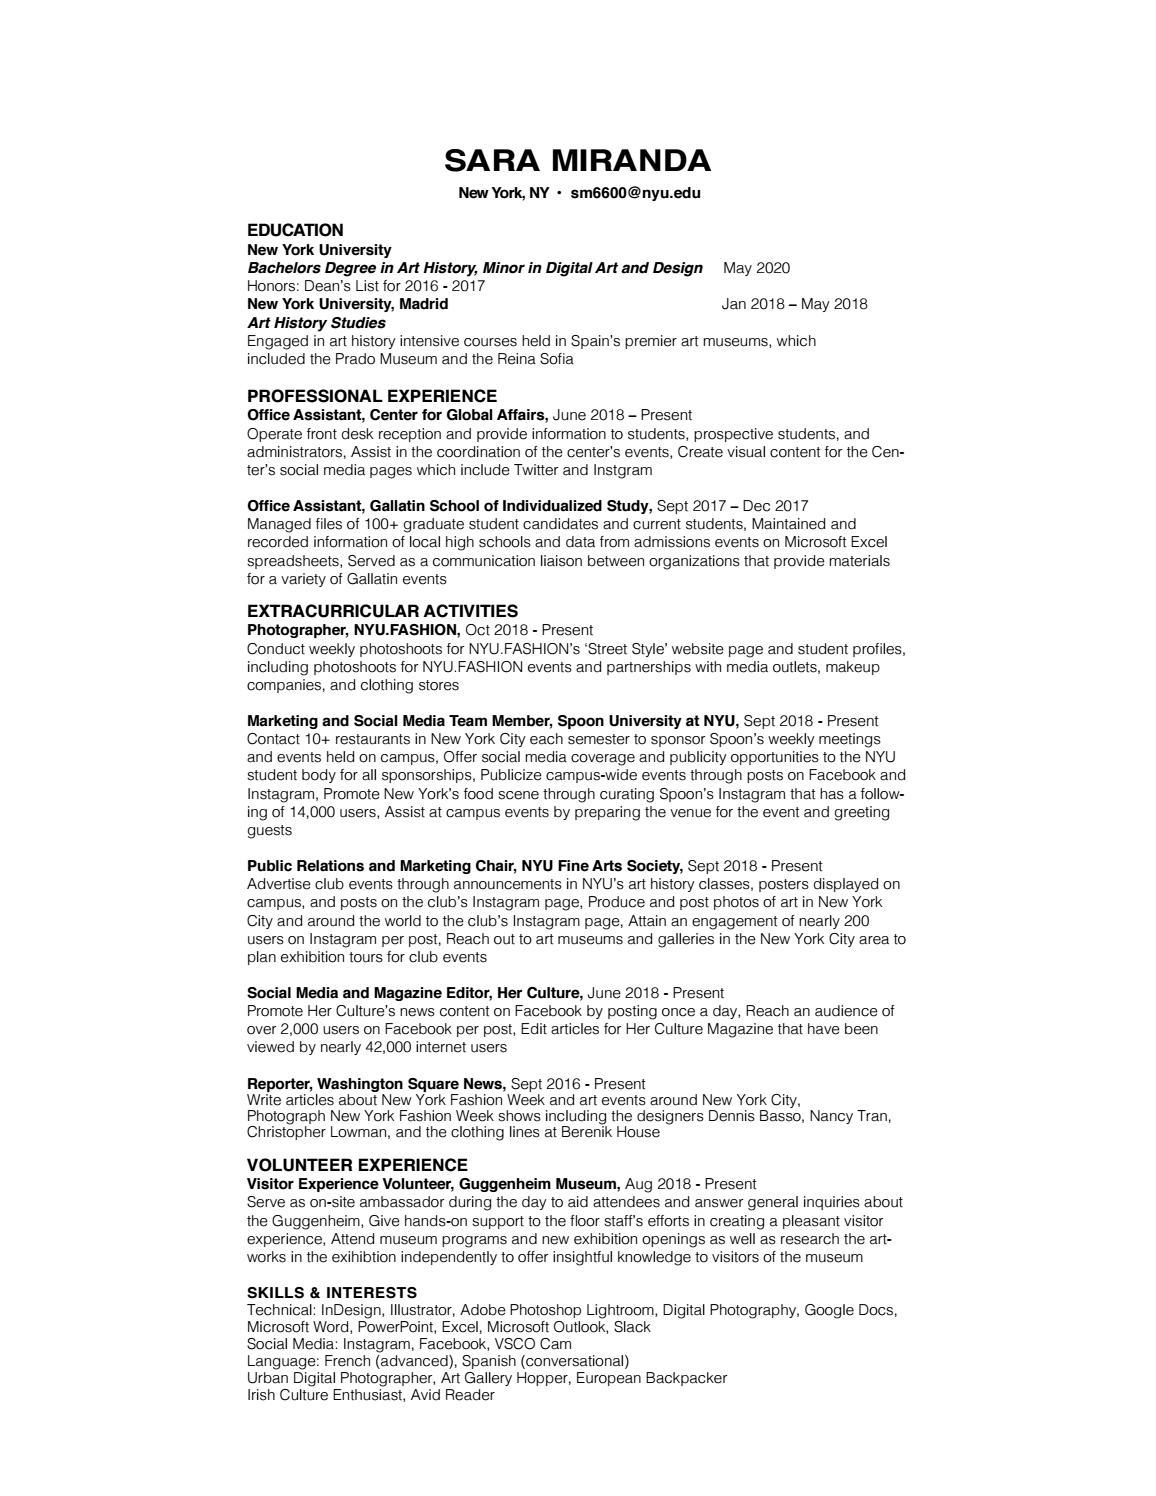 Sara Miranda's Resume by sara kelly616 - issuu